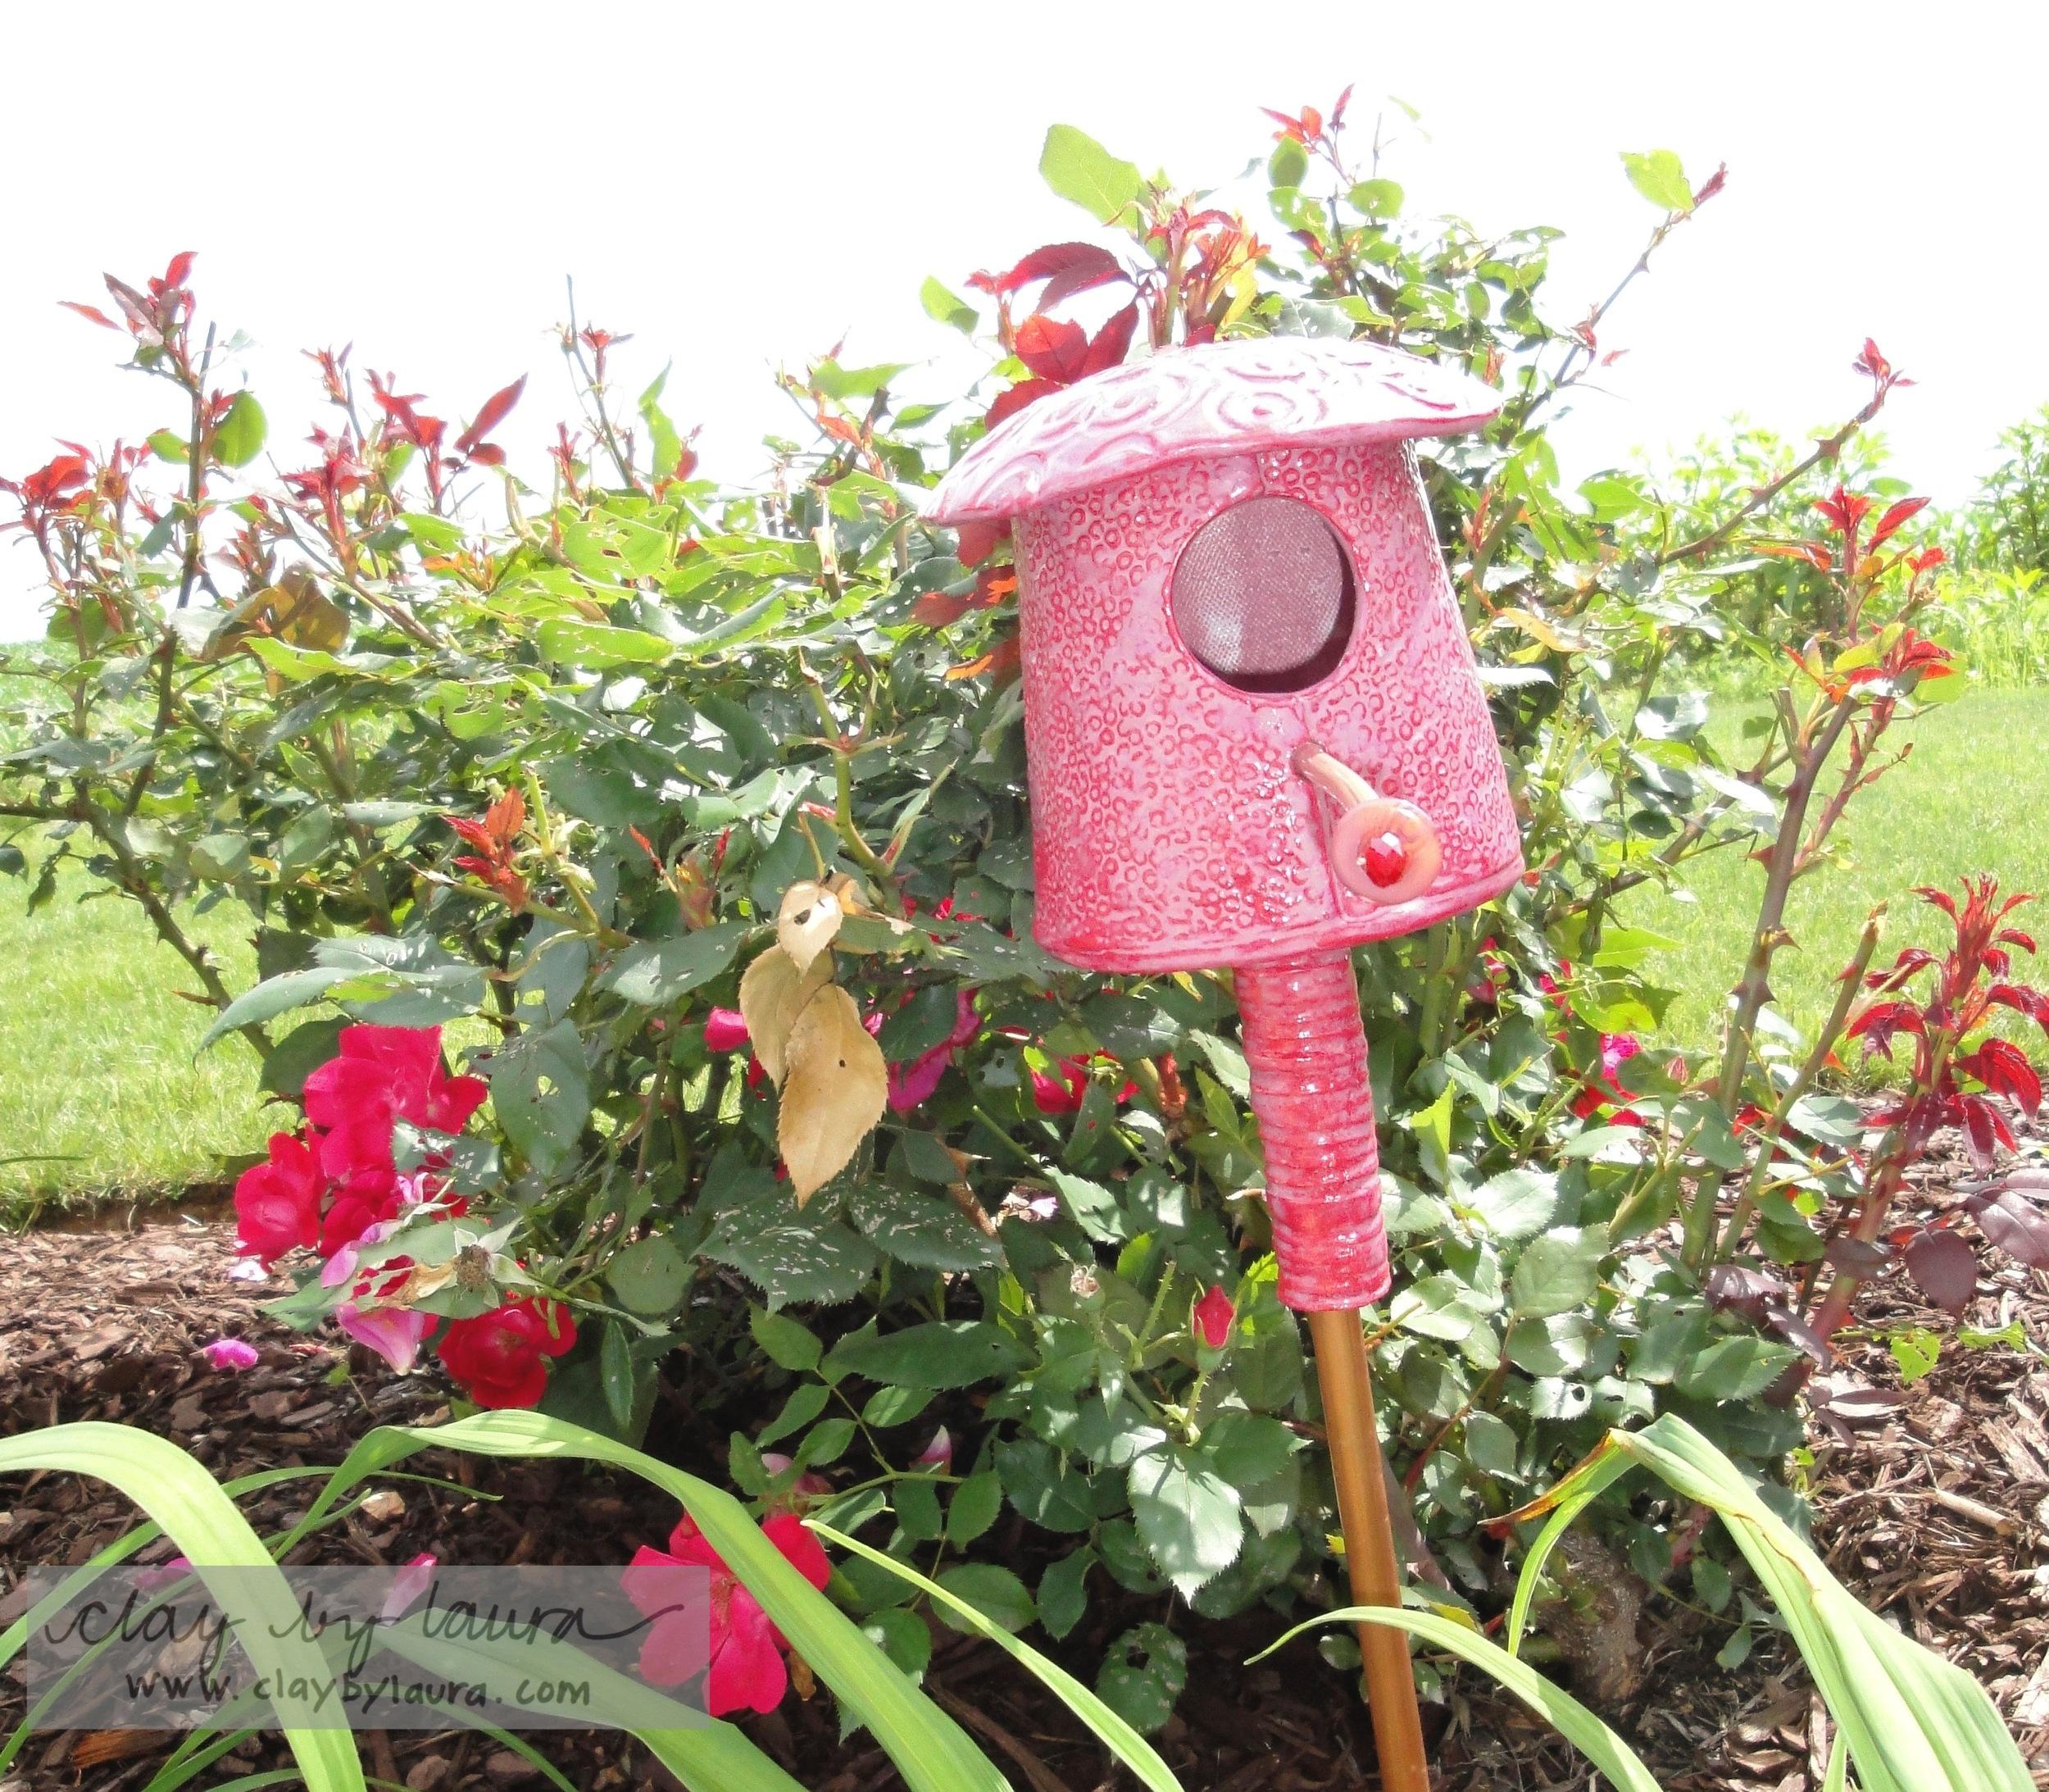 Bird House in the Garden.